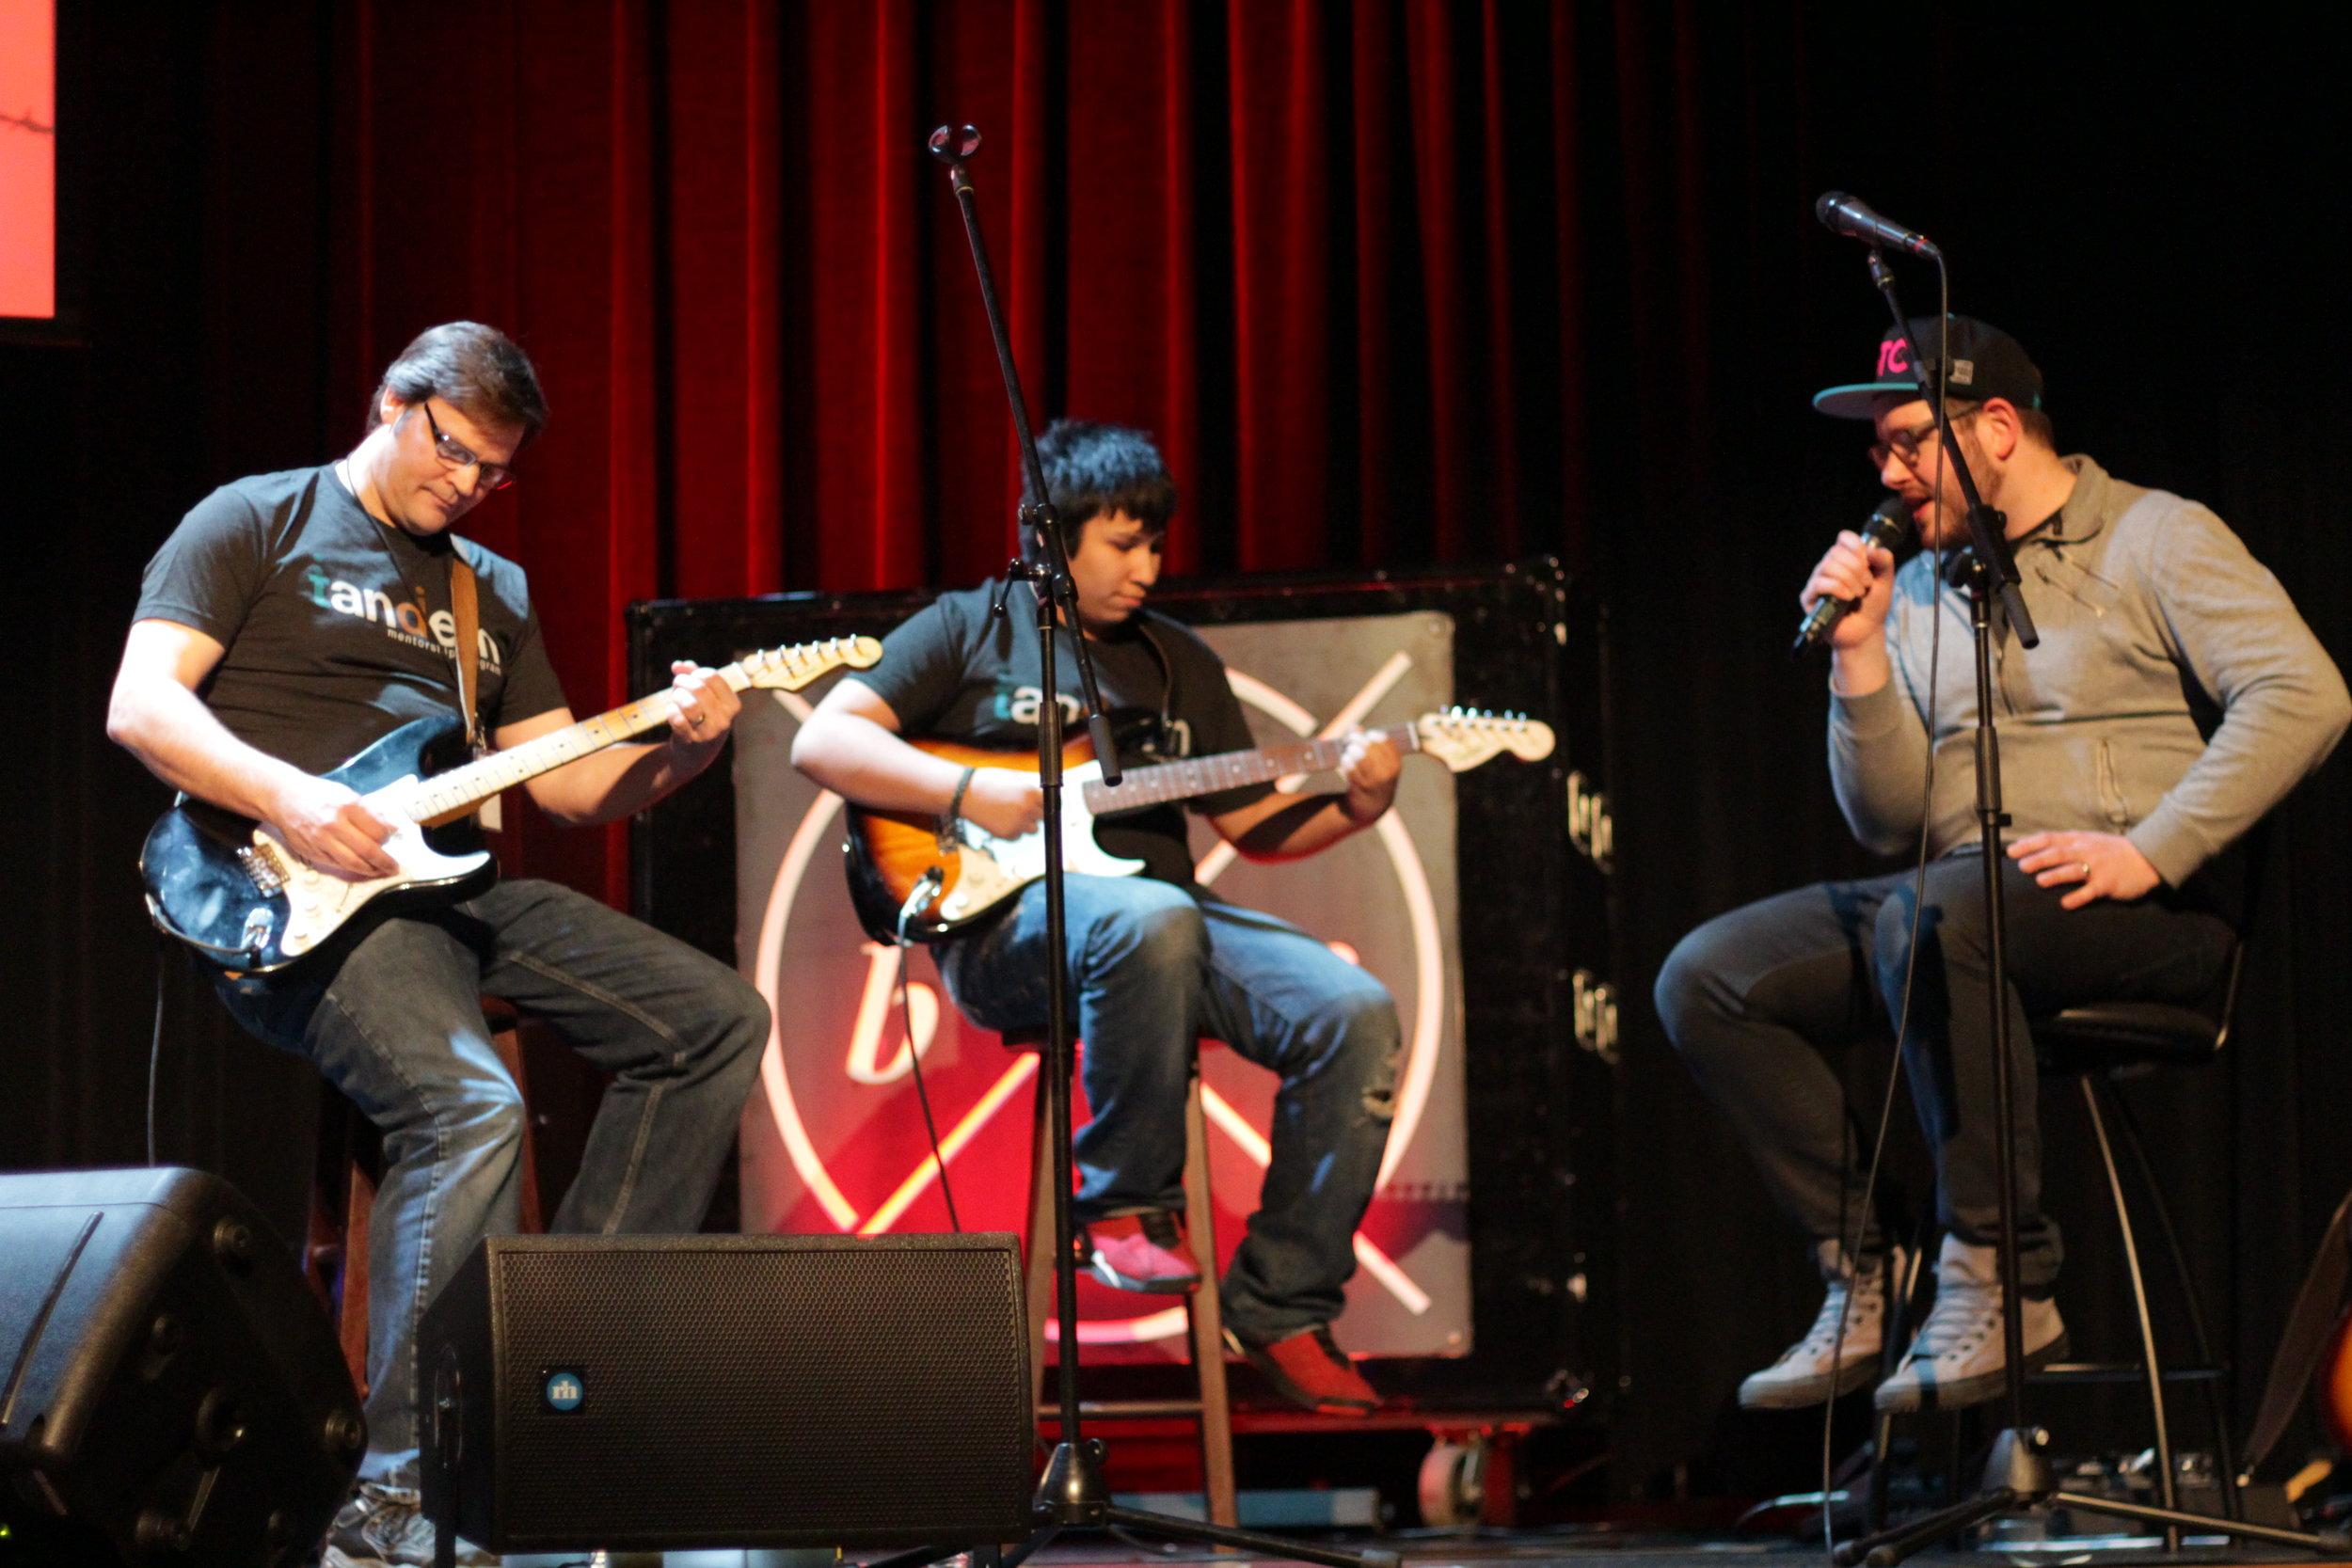 Antonio Guitar Performance.JPG